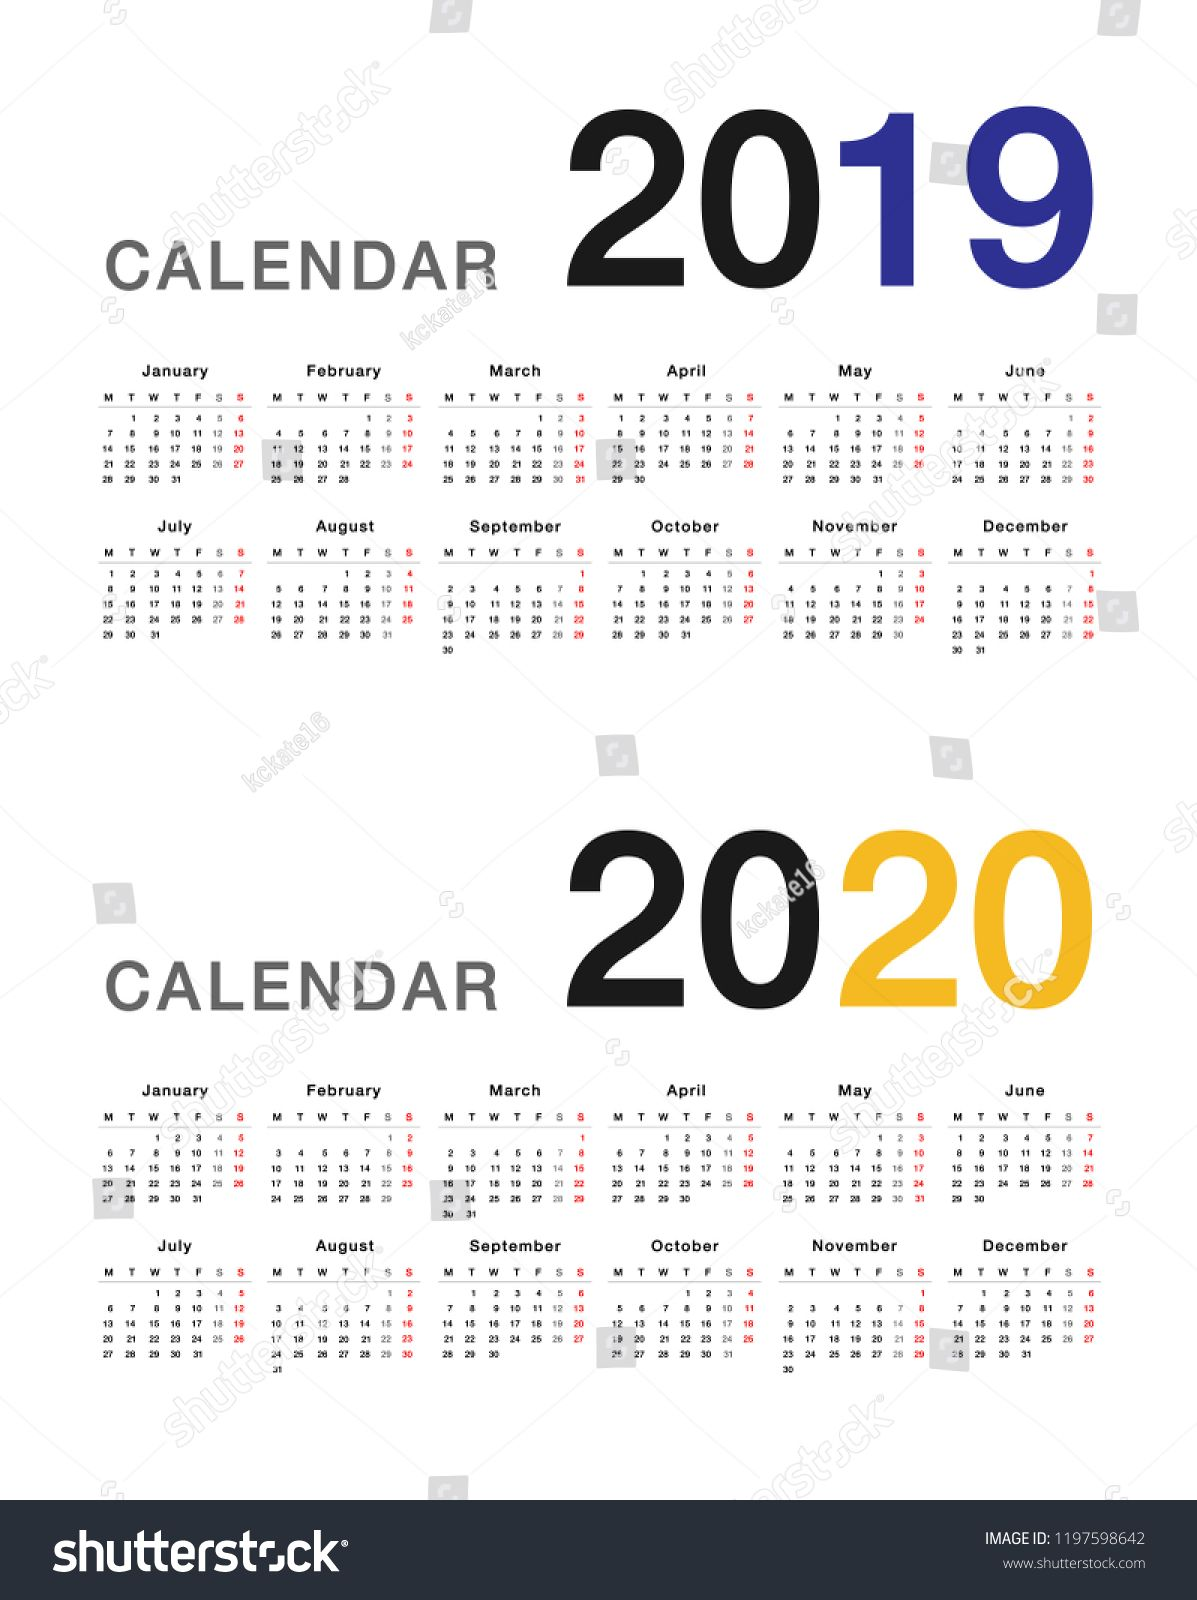 Calendar Year 2020.Year 2019 And Year 2020 Calendar Horizontal Vector Design Template